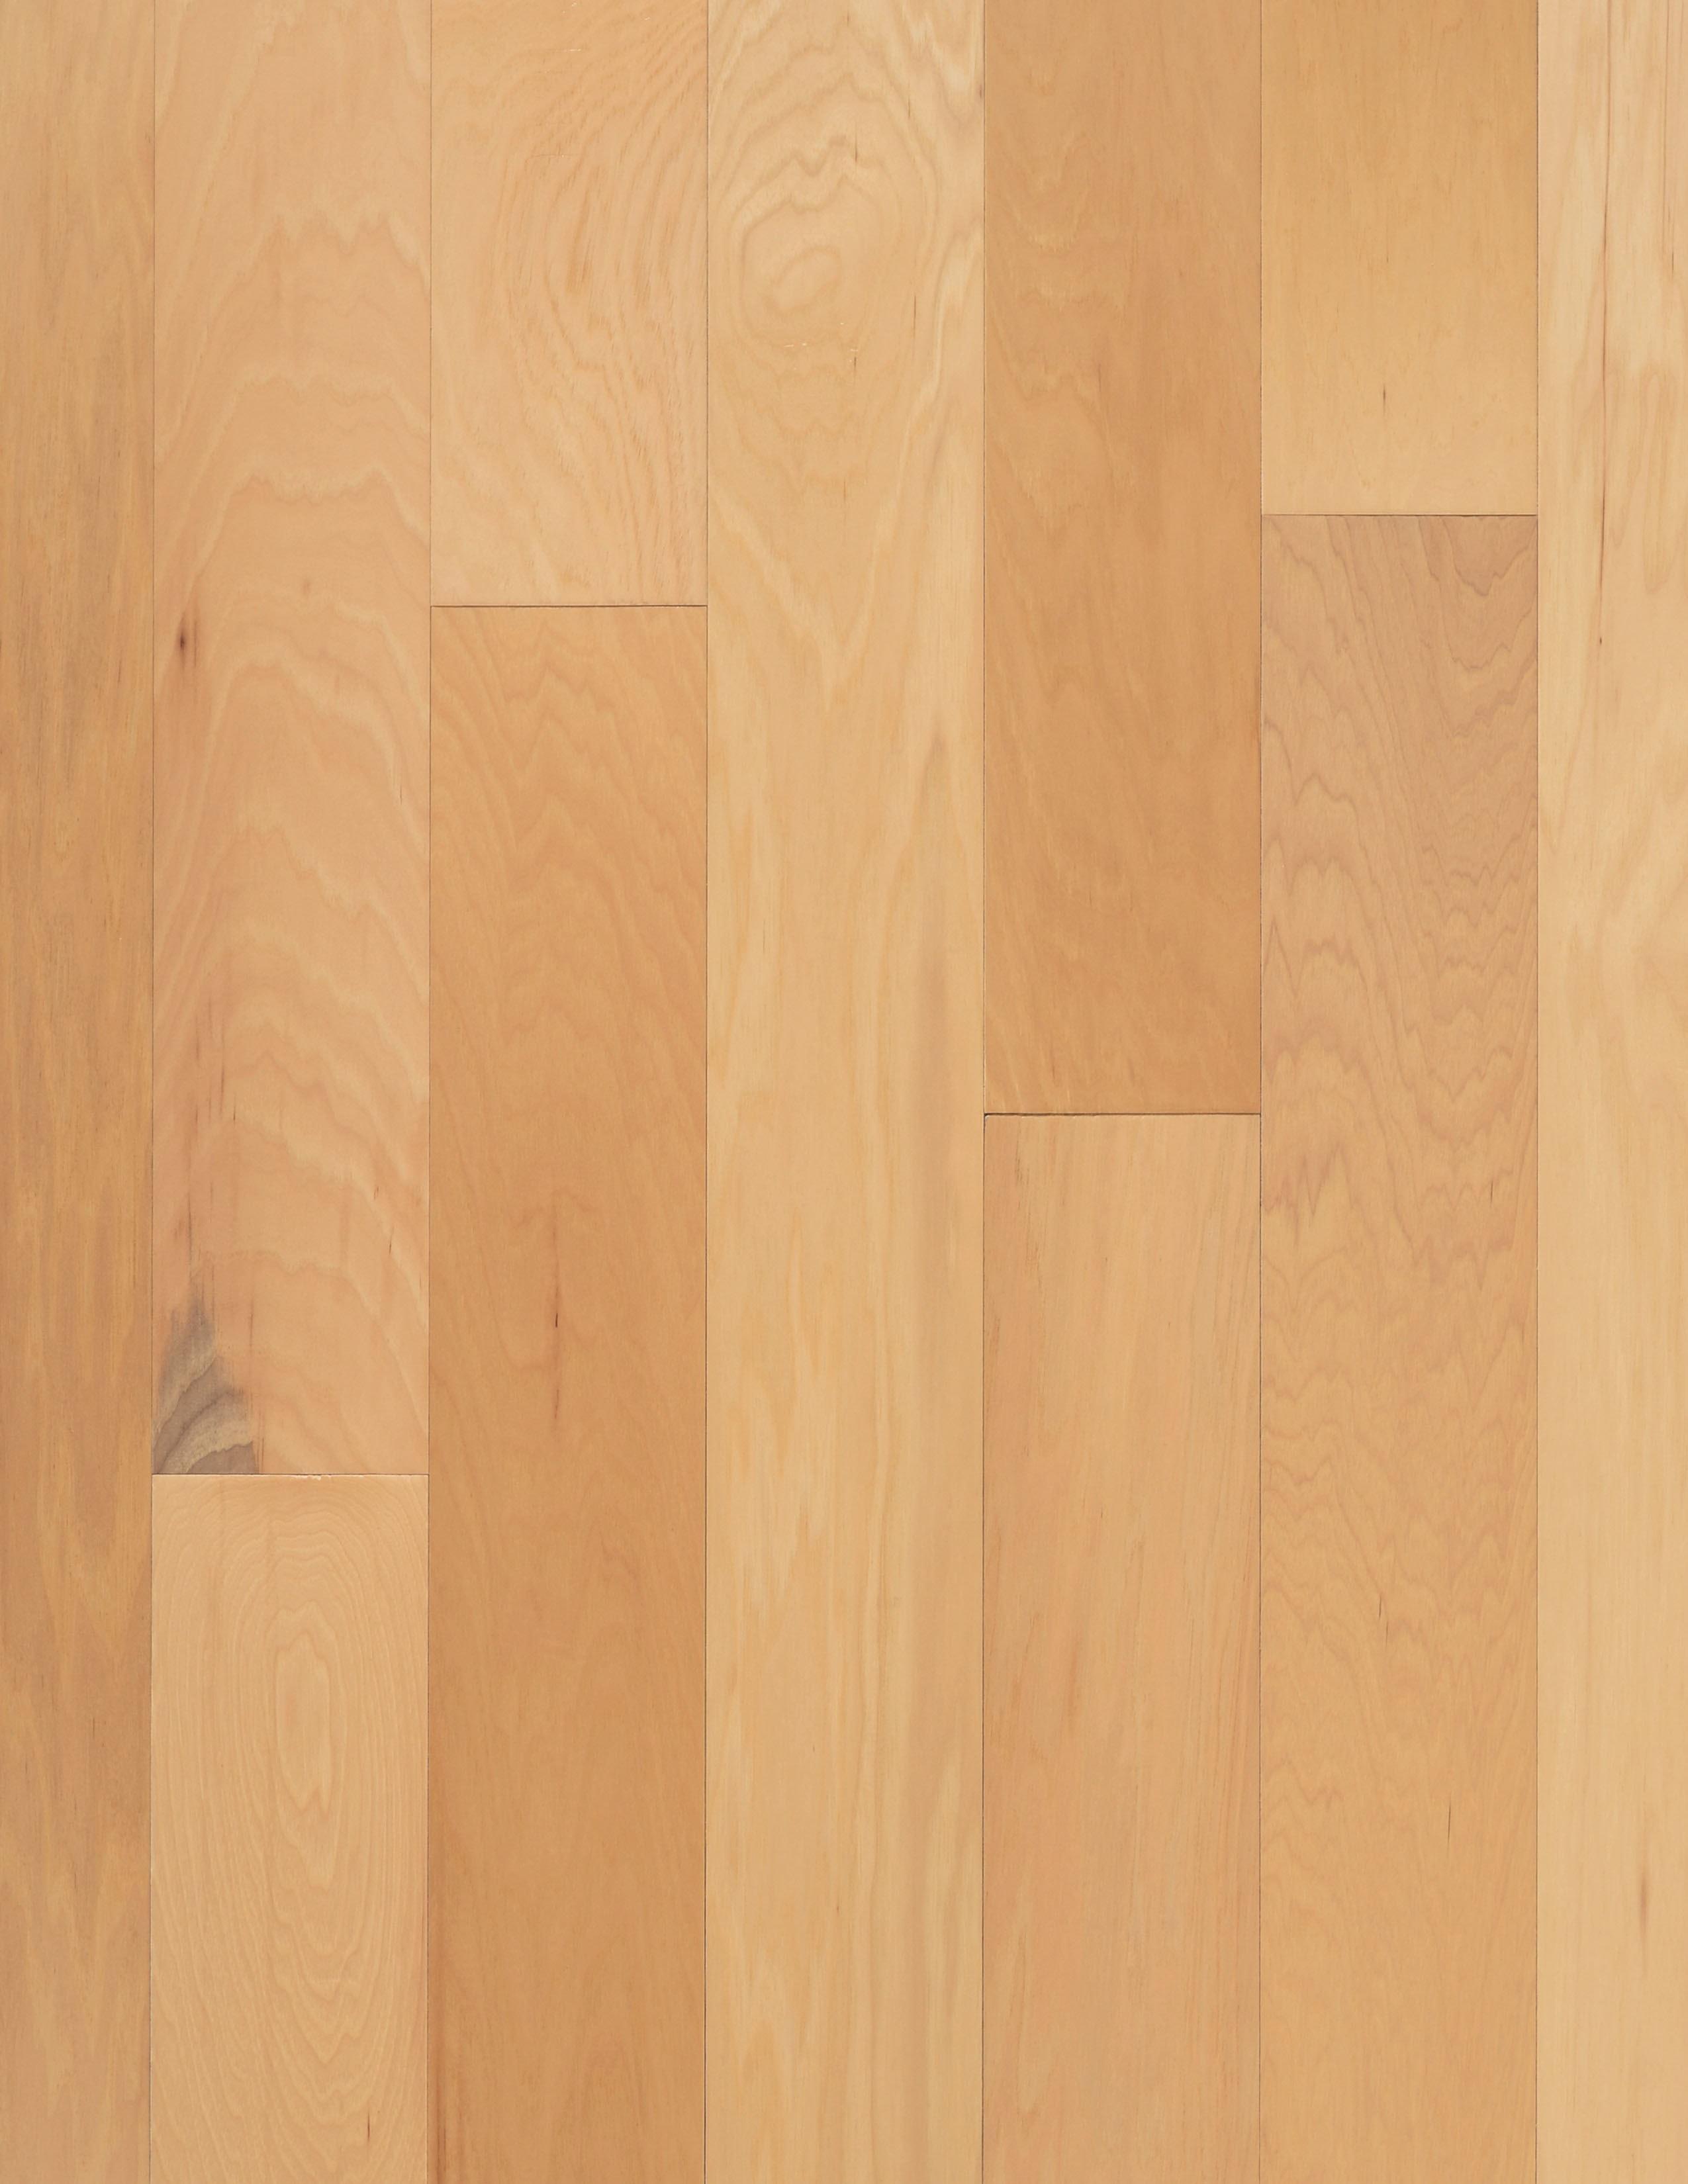 "Natural / Hickory / 9 Coats UV Aluminum Oxide / ABCDE / 3/8"" x 5"" x R.L. Big Ass Wood Floors - Riverside Collection 0"